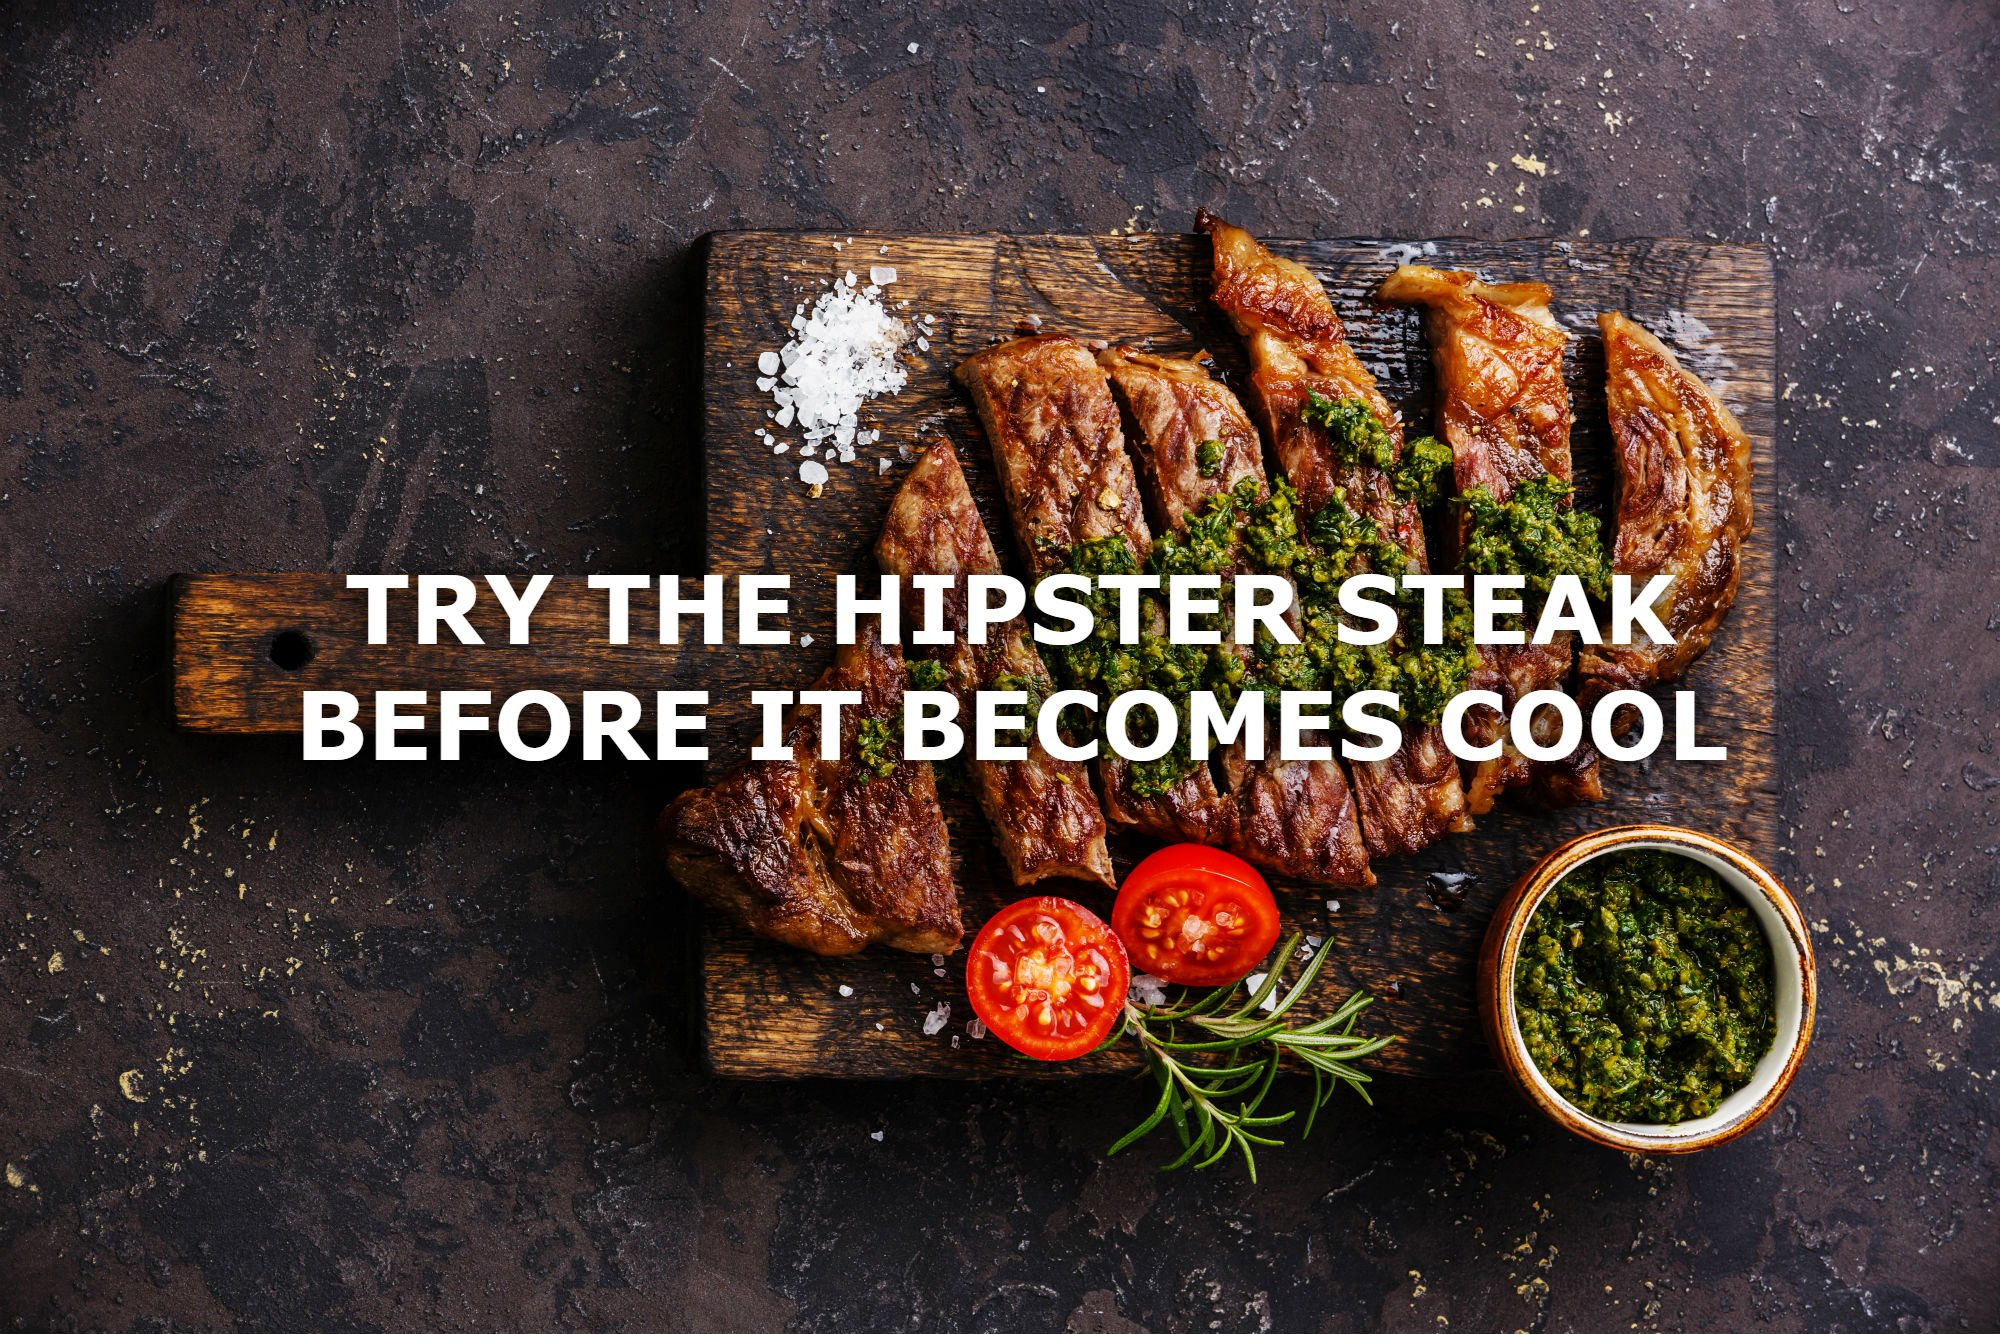 Hipster Steak